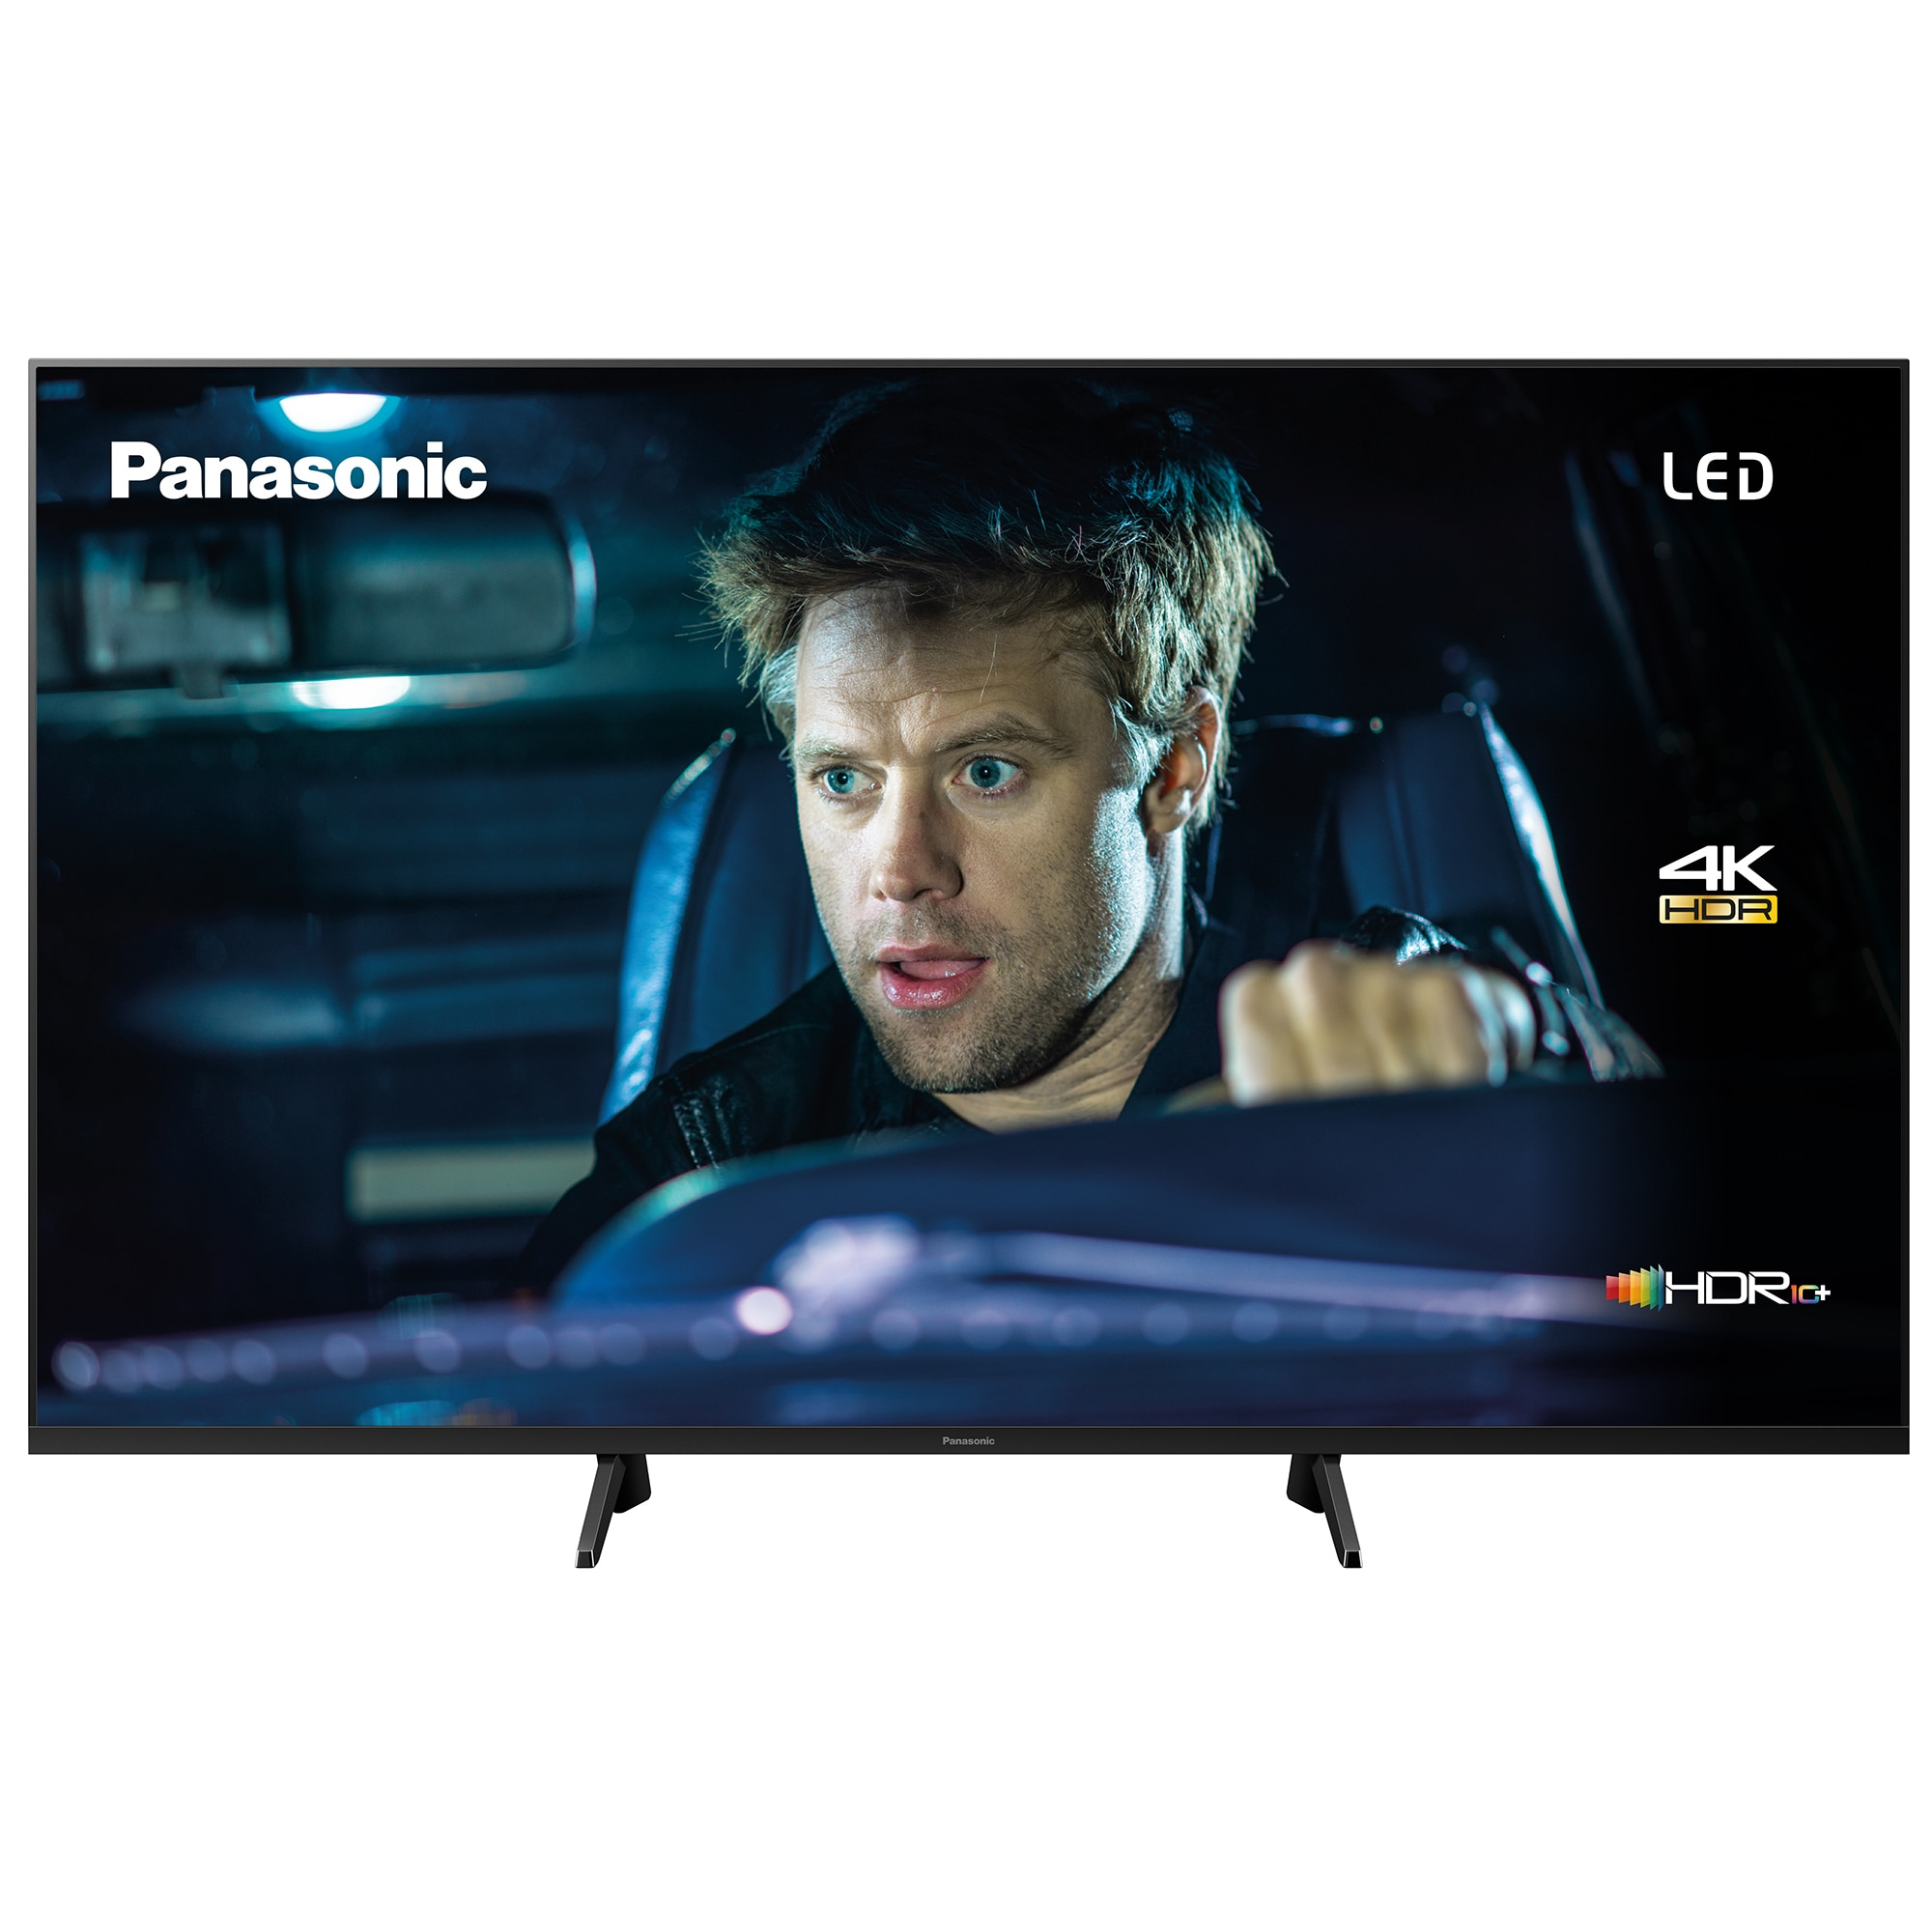 Fotografie Televizor LED Smart Panasonic, 100 cm, TX-40GX700E, 4K Ultra HD, Clasa A+